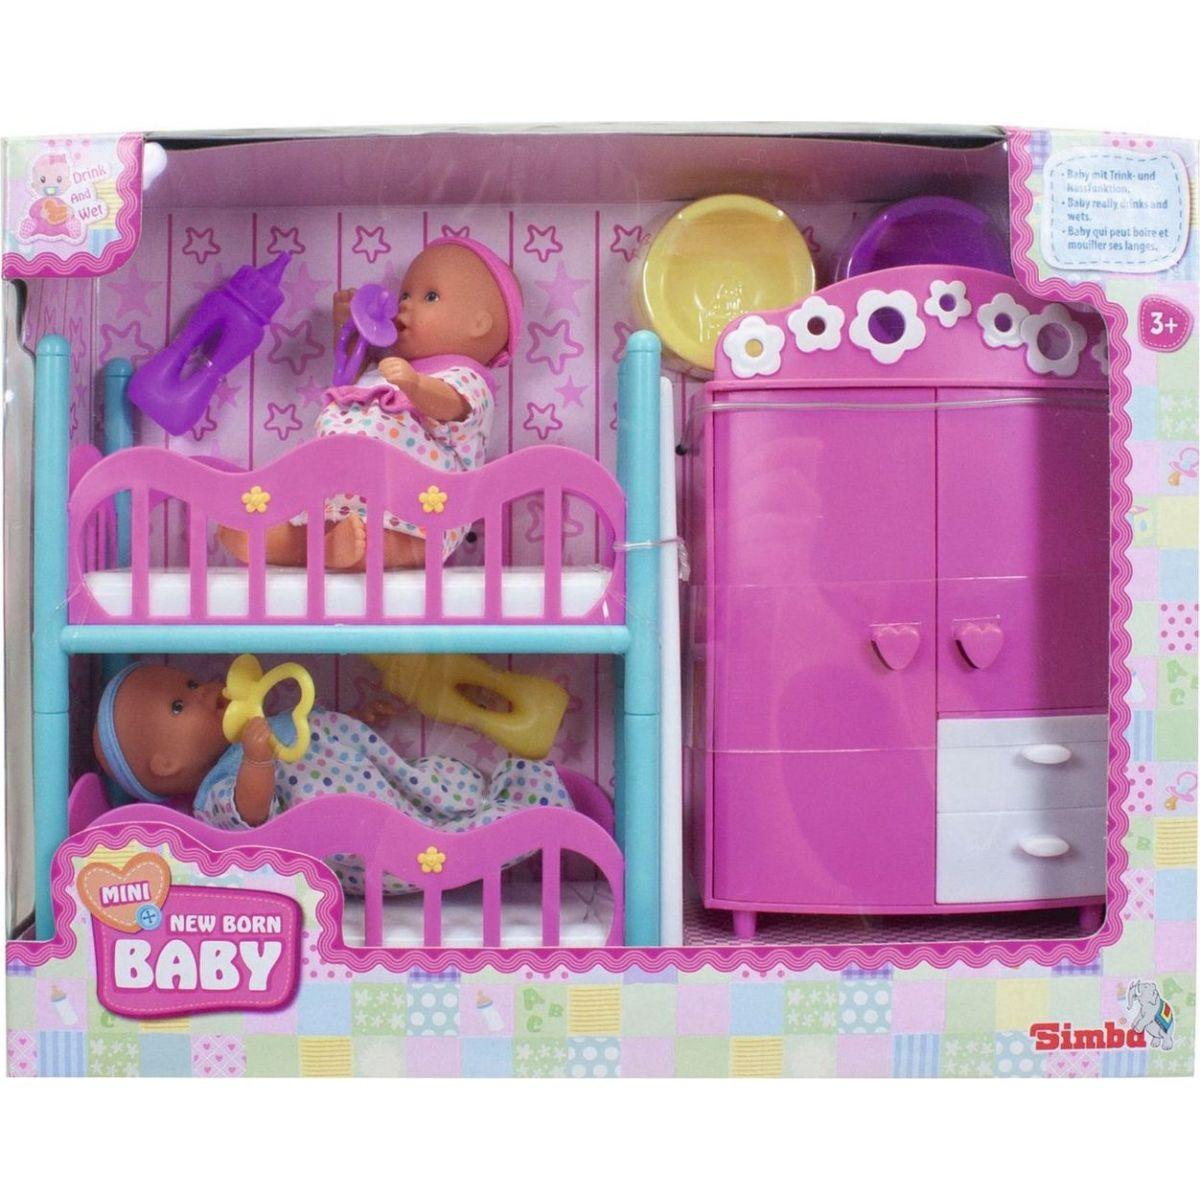 Simba Mini New Born Baby Dětský pokoj a 2 panenky